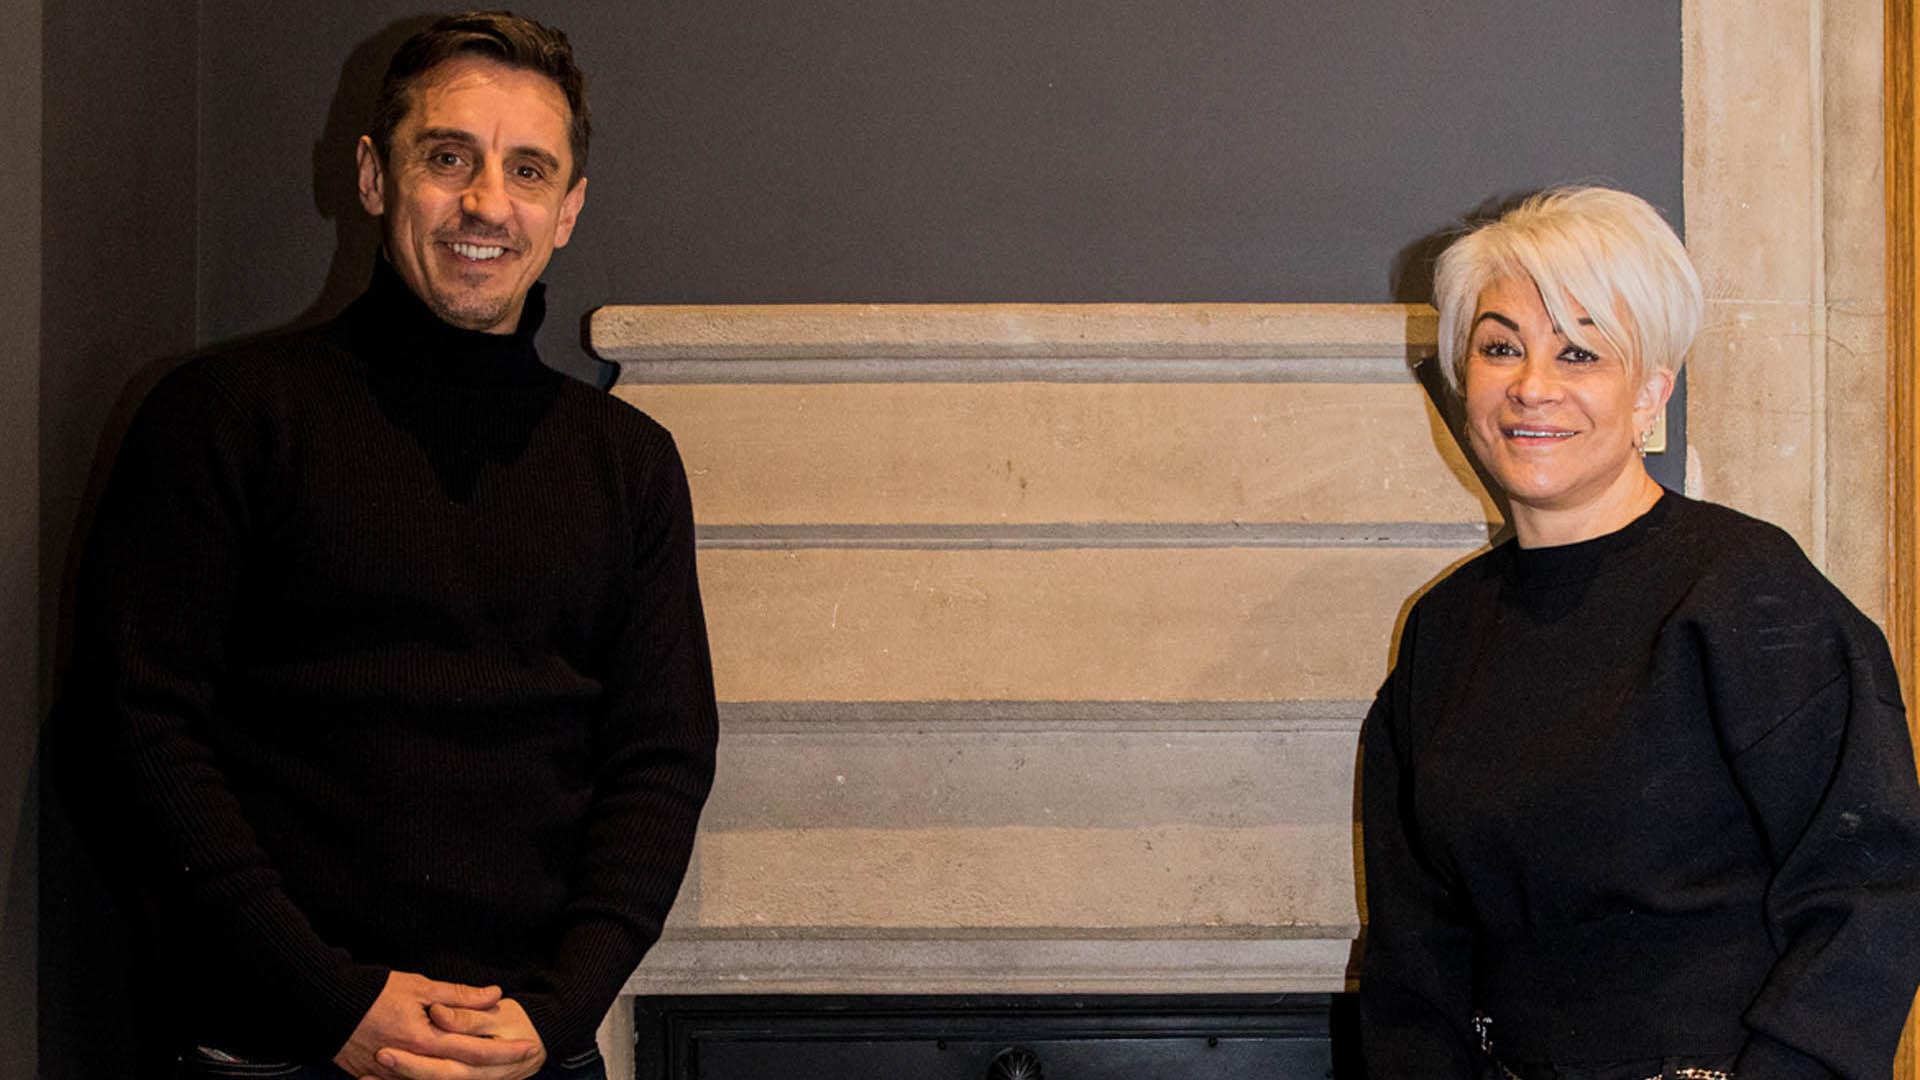 Gary Neville talks with Liz Taylor